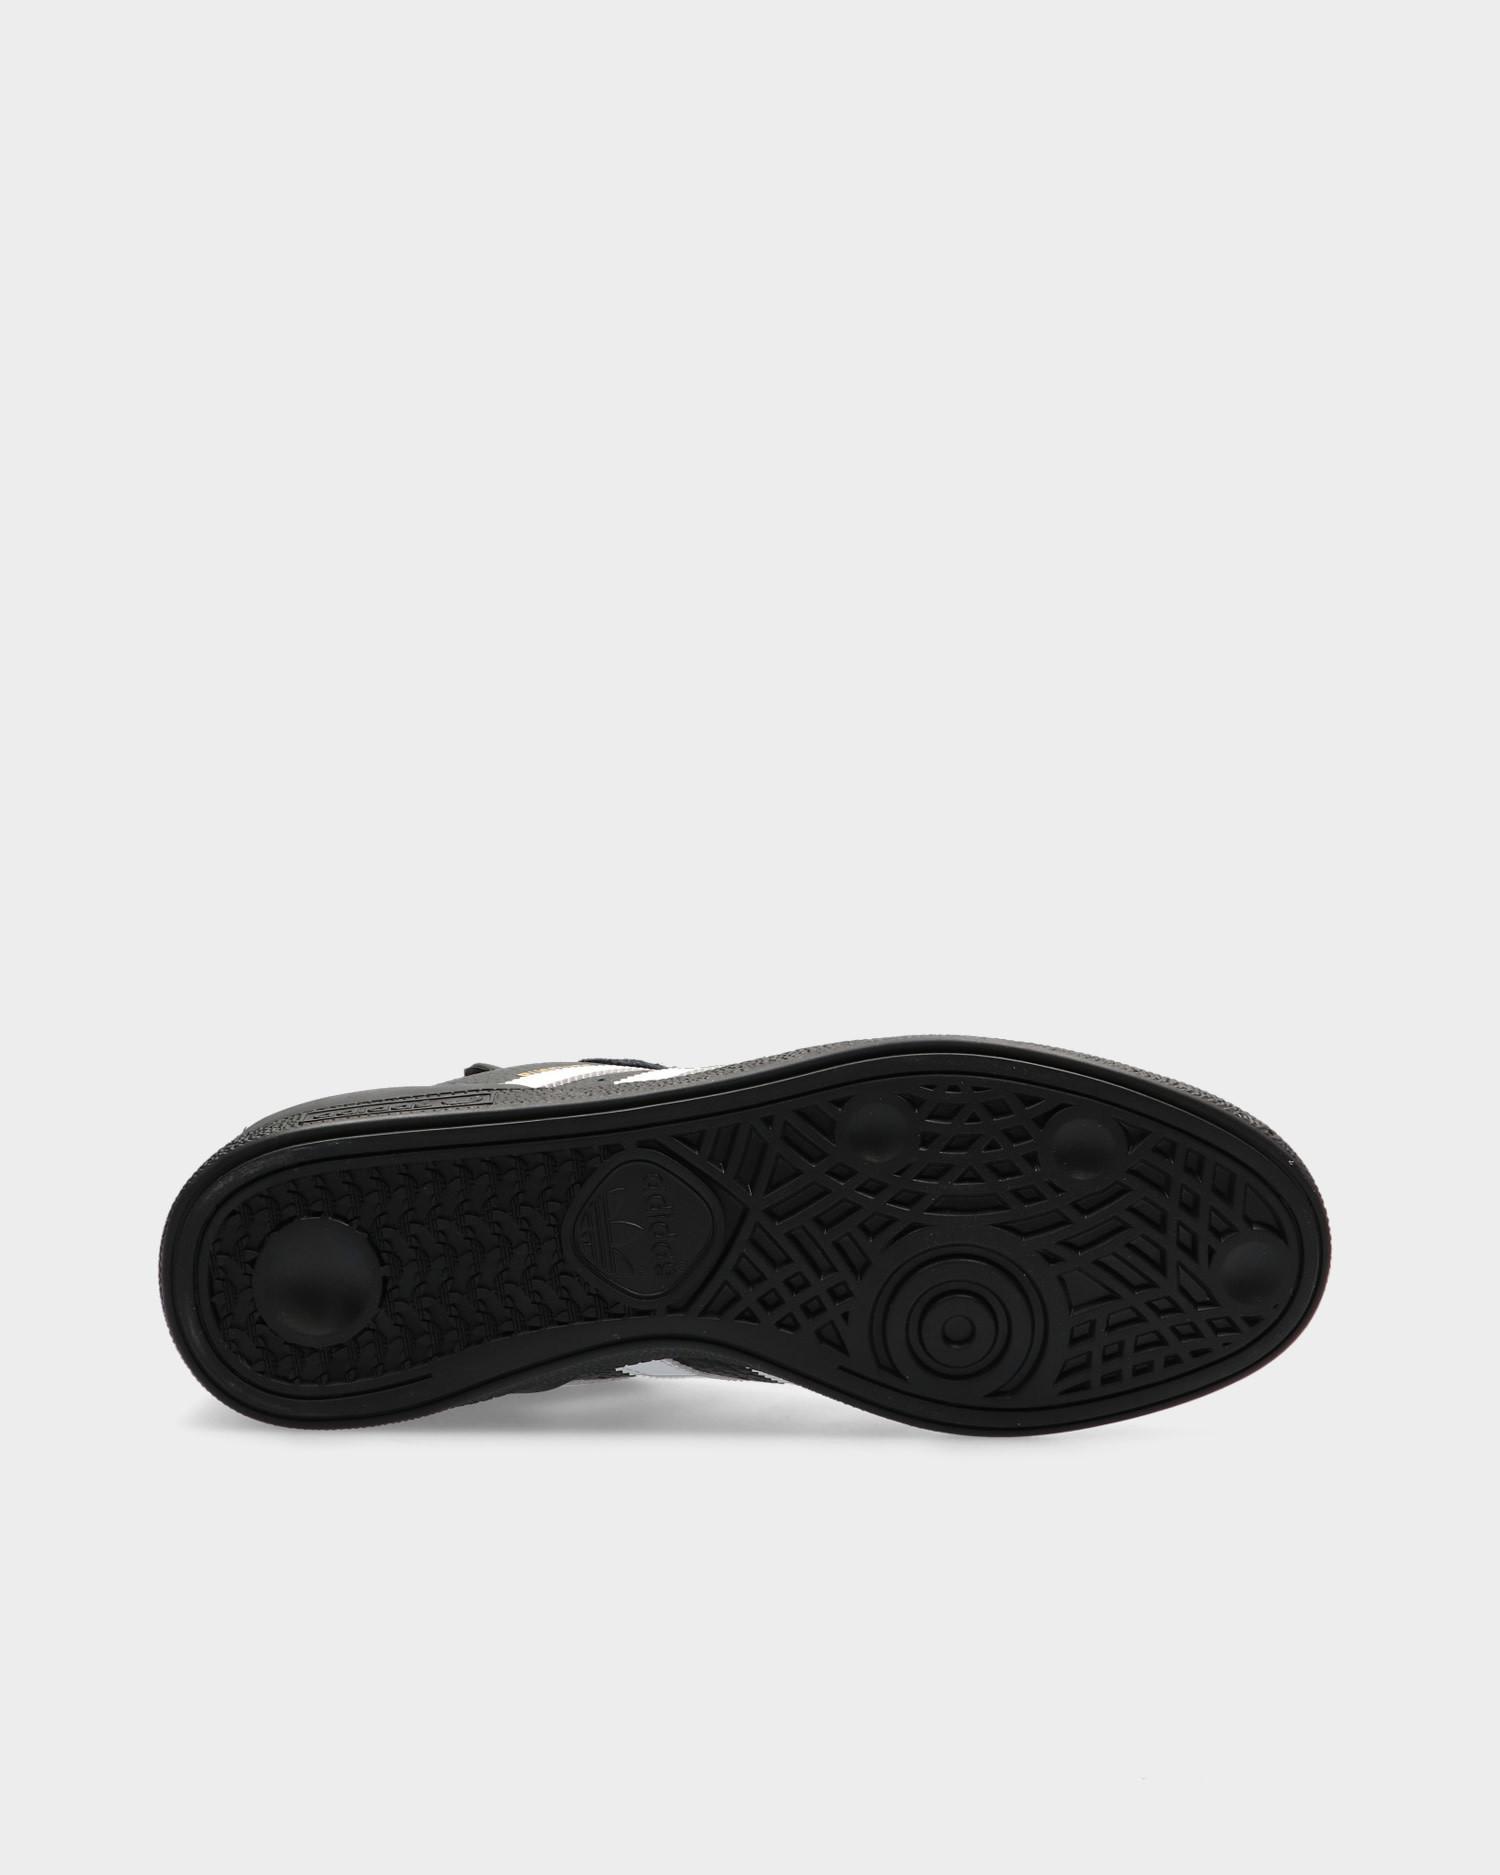 adidas Busenitz Cblack/FtwWht/VivRed